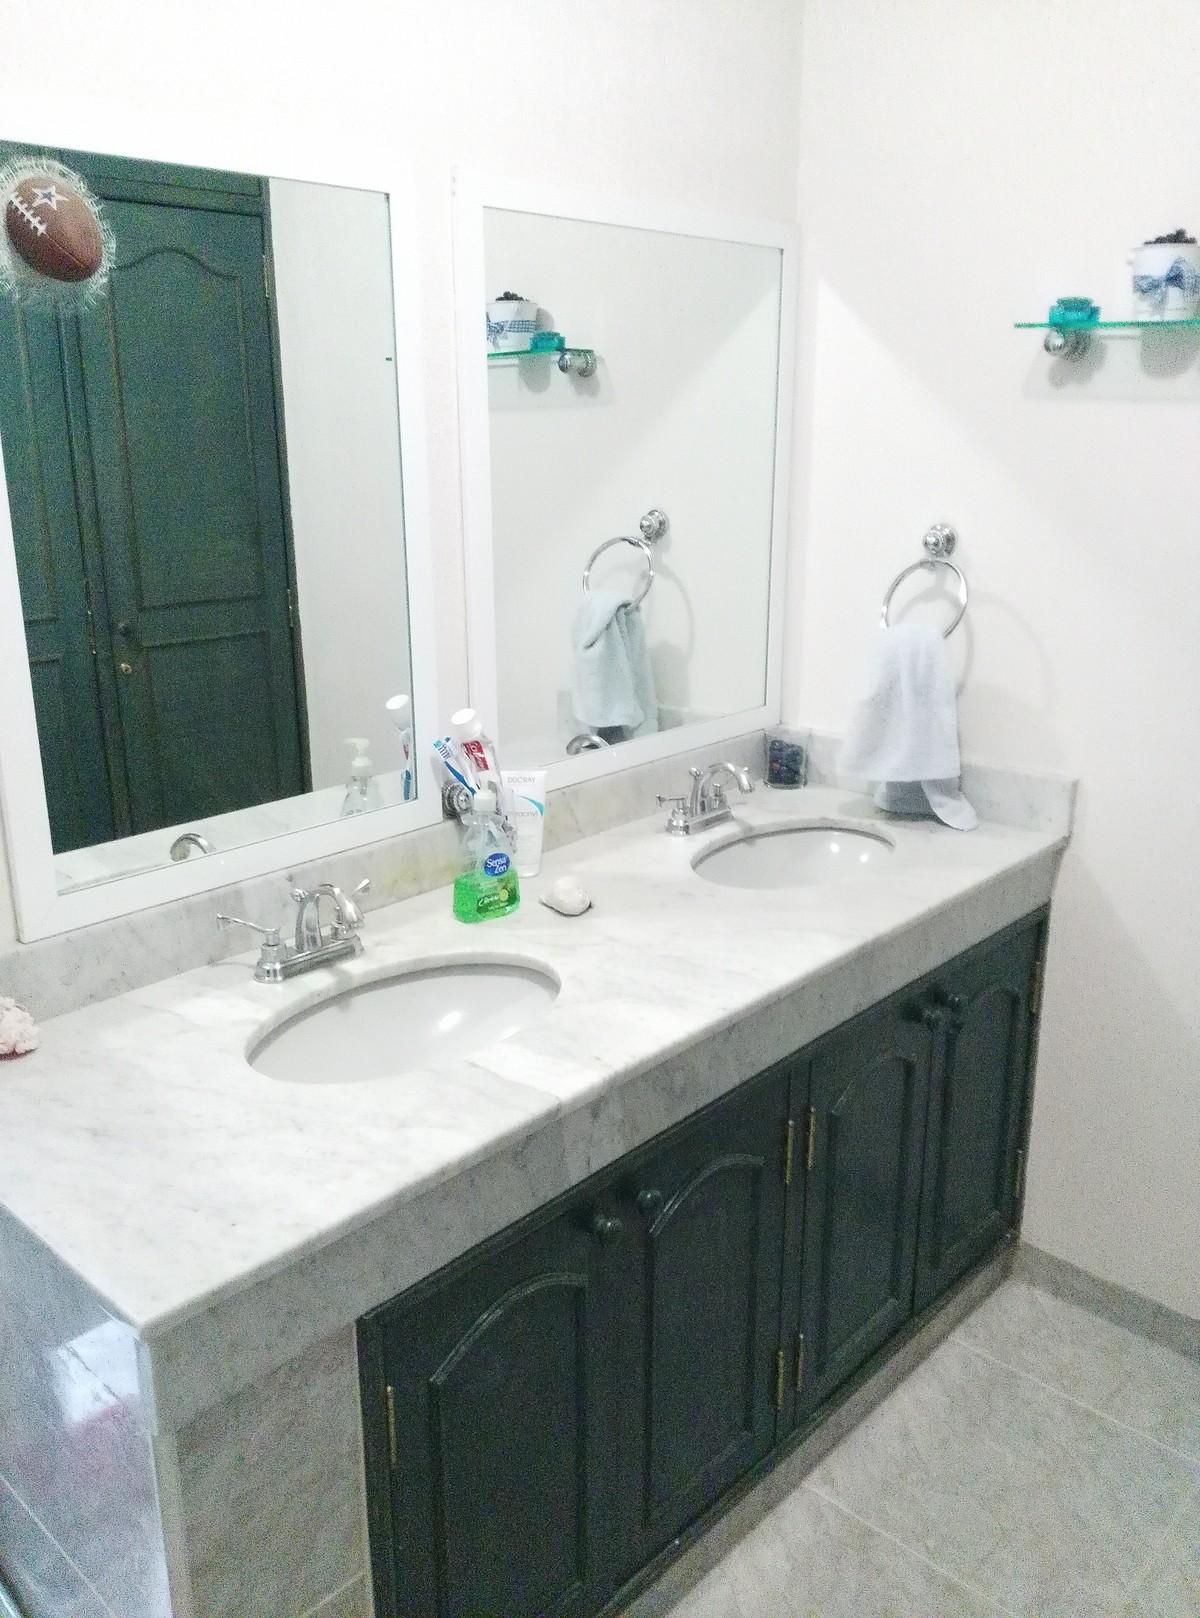 6 de 22: Doble lavabo en baño